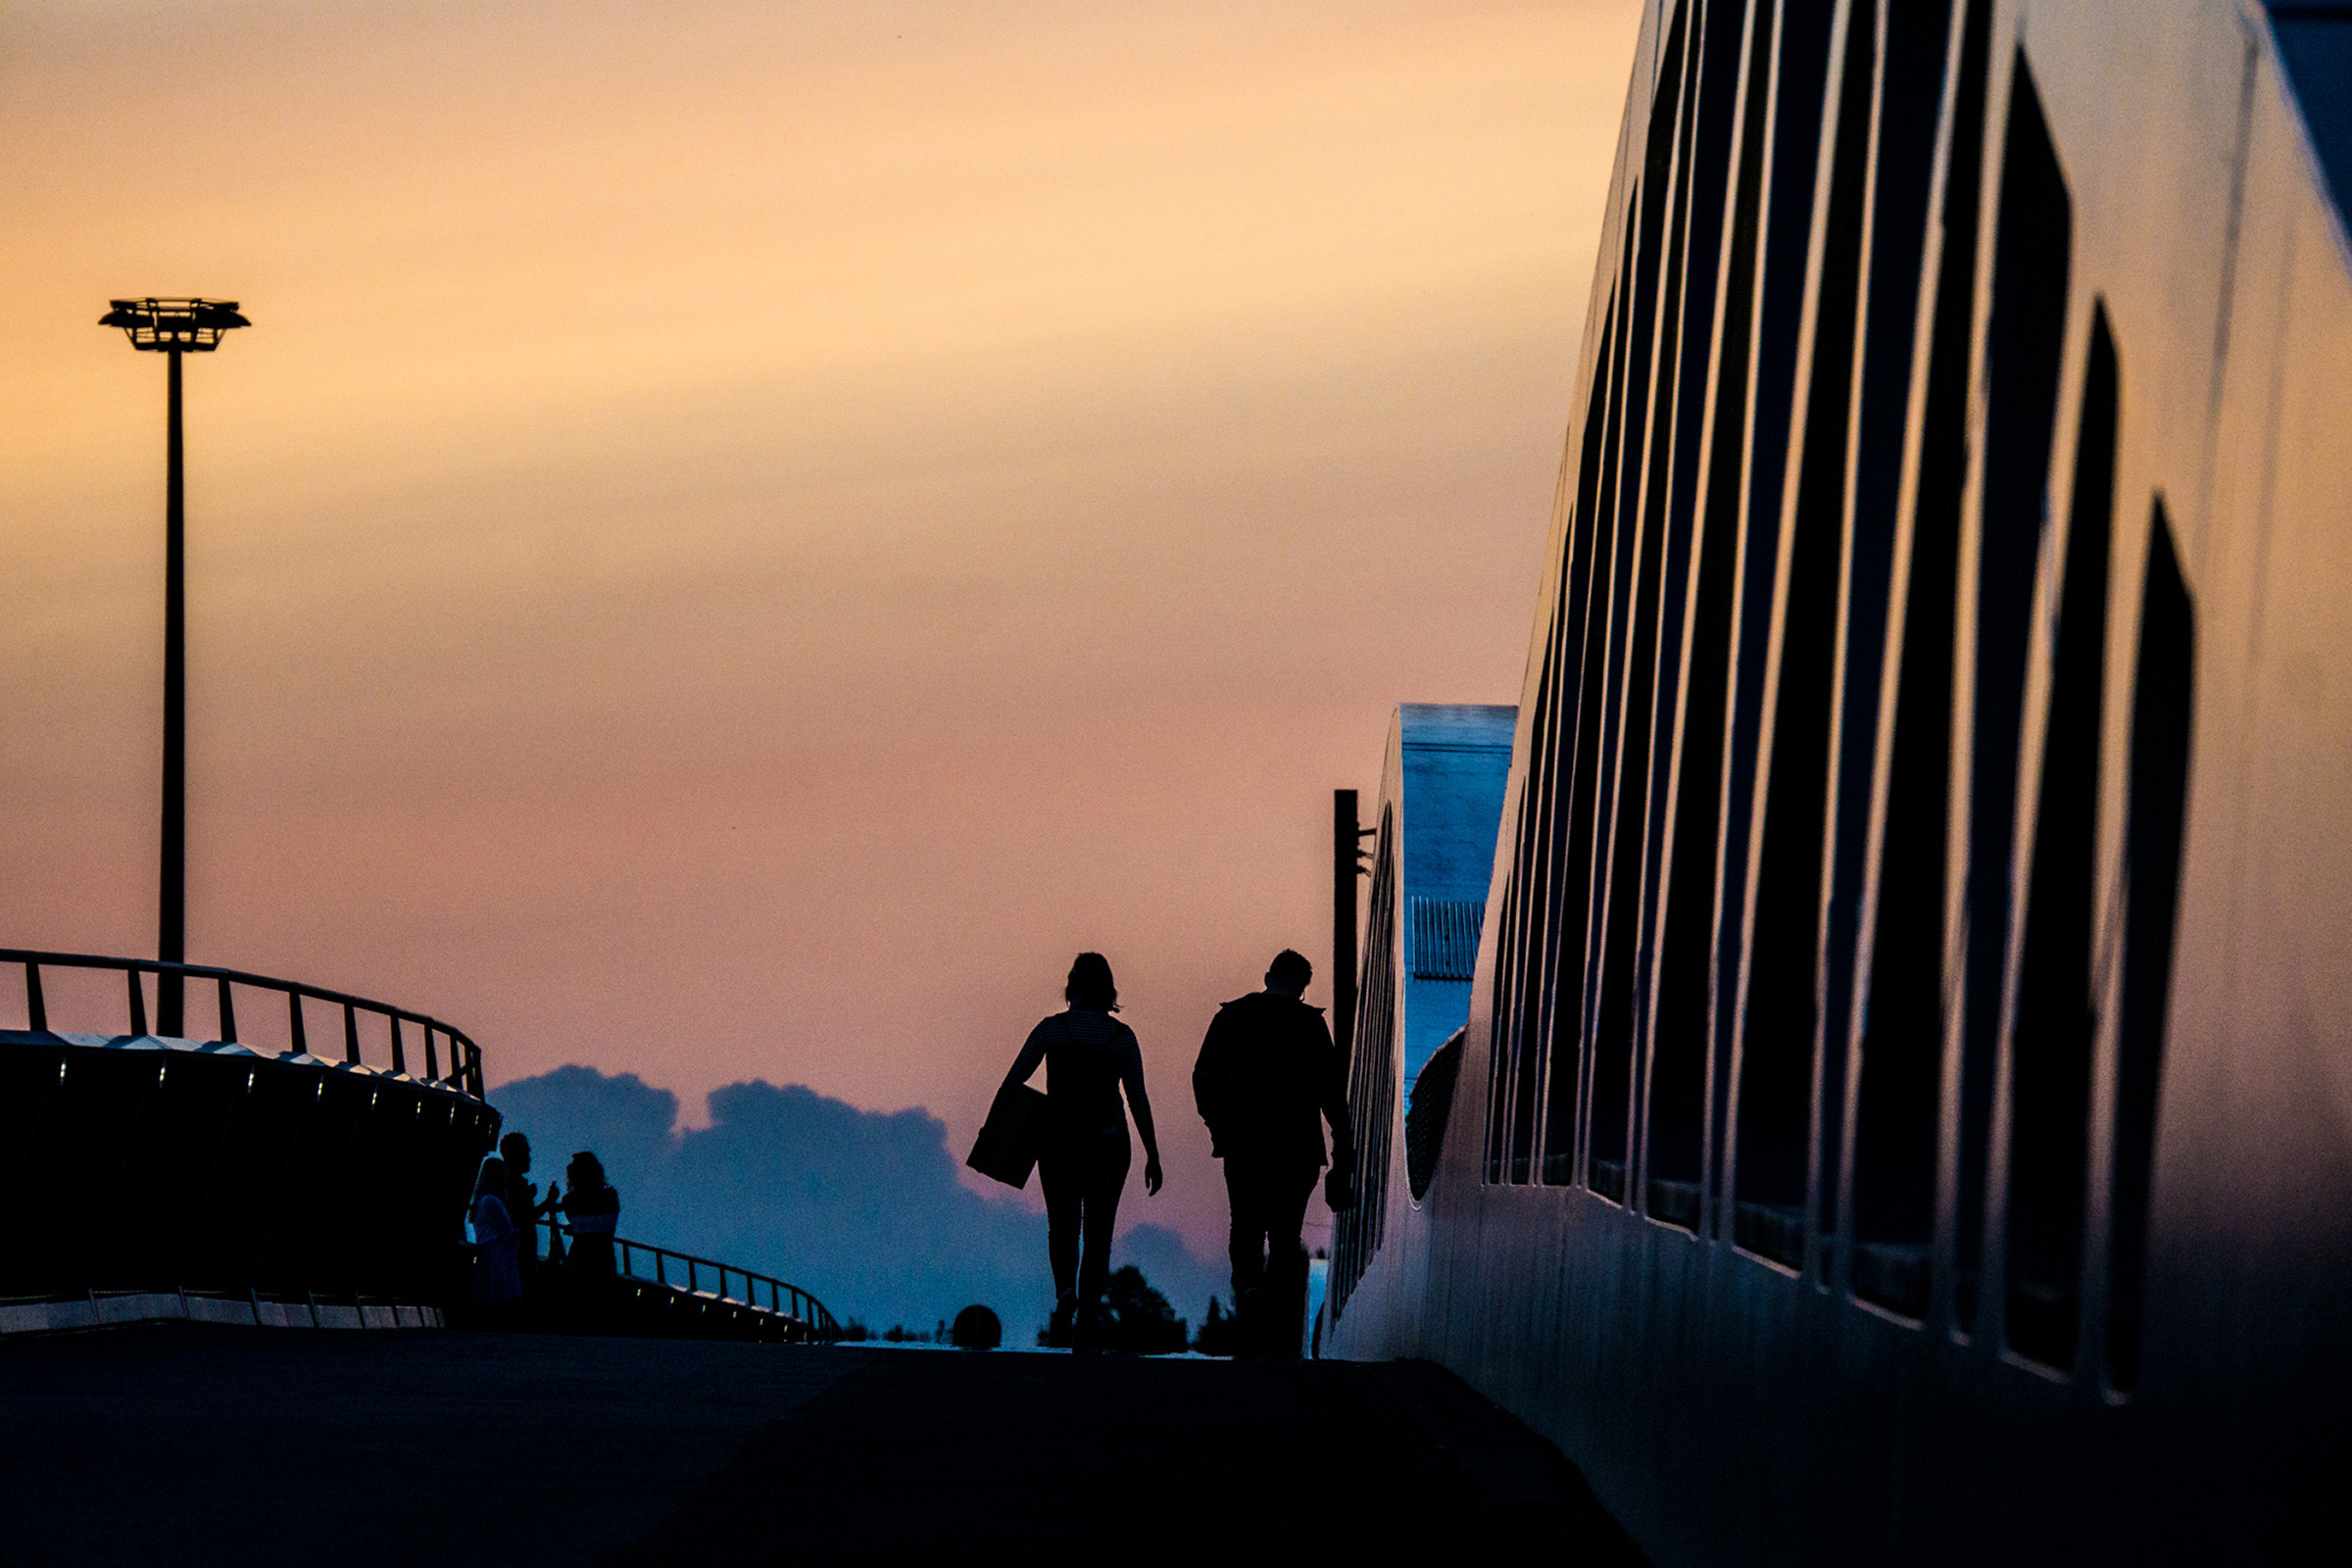 KBB_Kienlesbergbrücke-Ulm_30